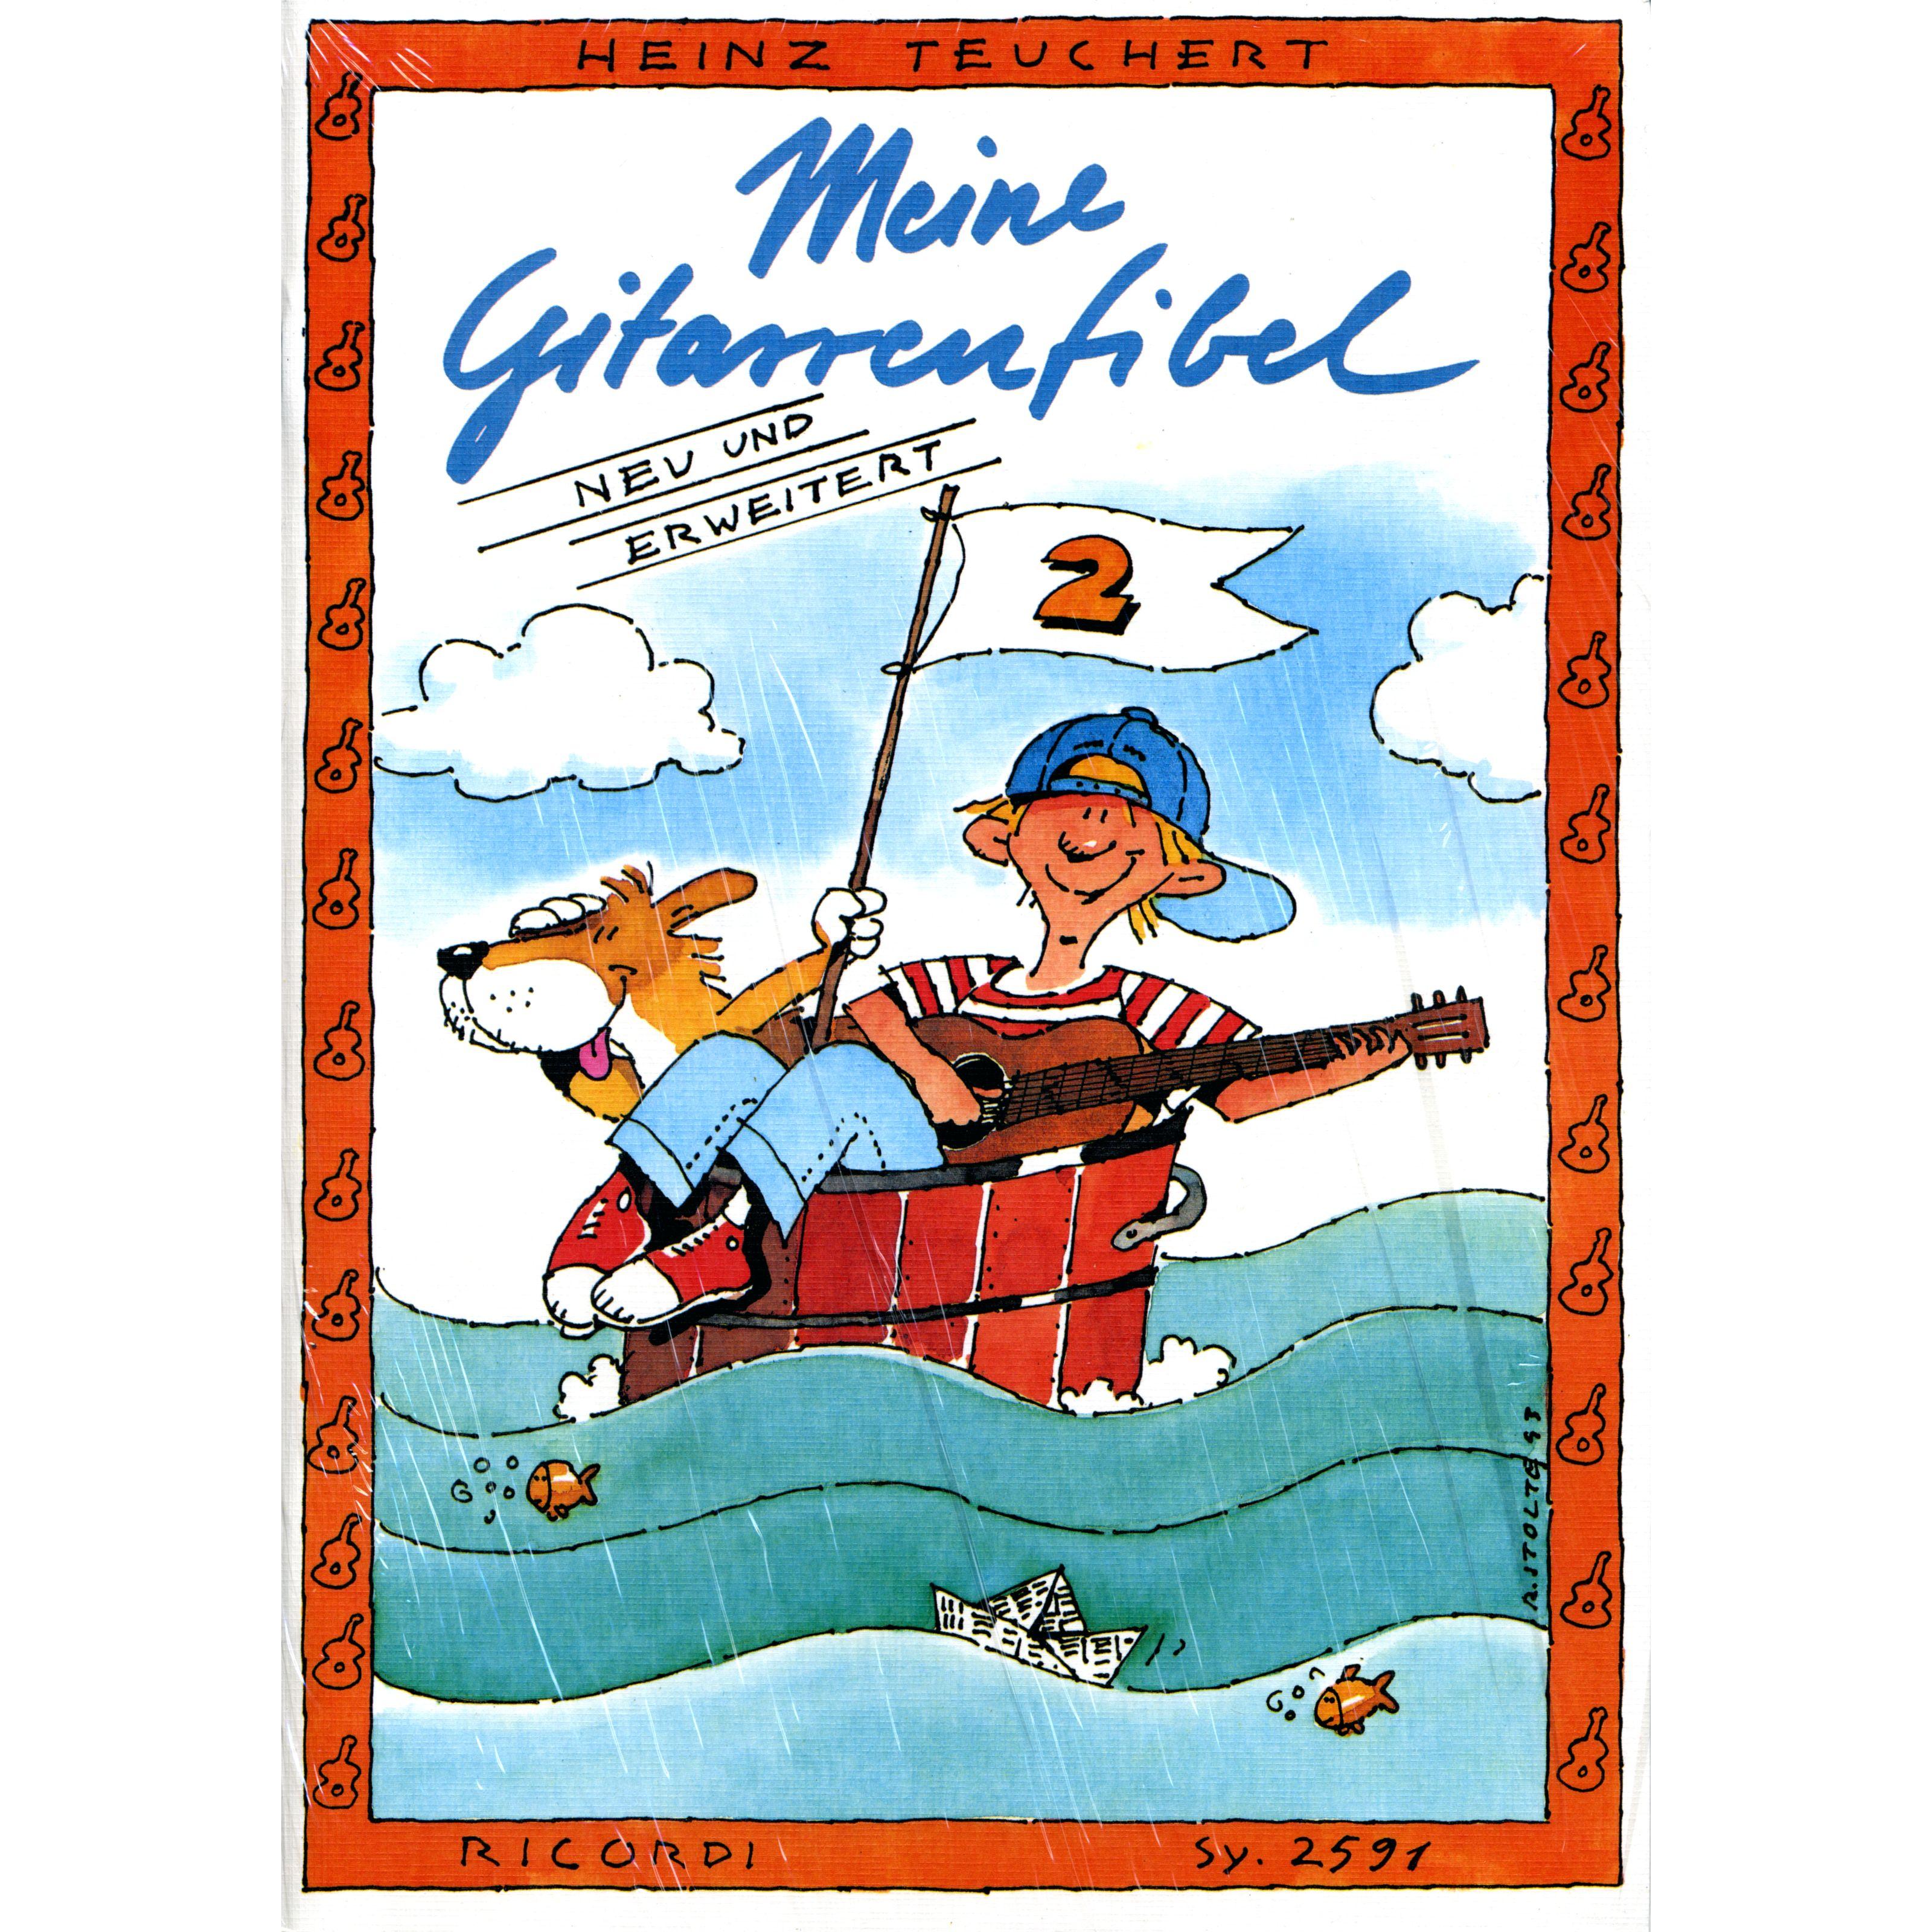 Ricordi Verlag - Meine Gitarrenfibel Bd. 2 Heinz Teuchert SY 2591